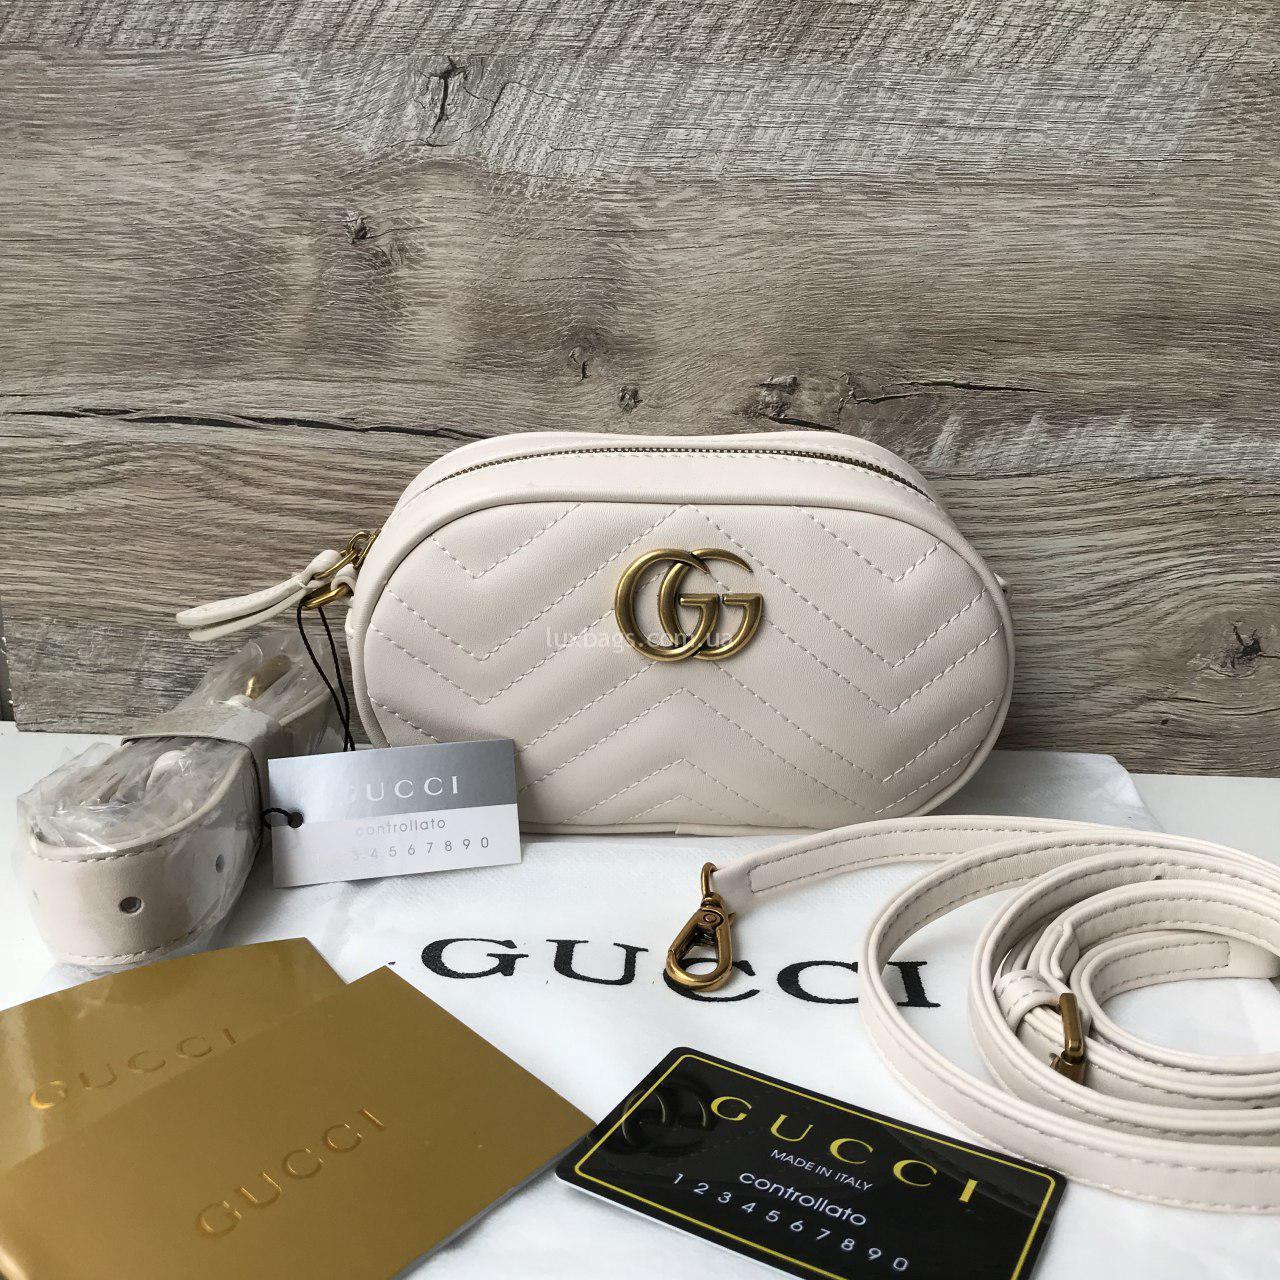 2084434920f8 Клатч, сумка поясная Gucci Marmont Купить на lux-bags